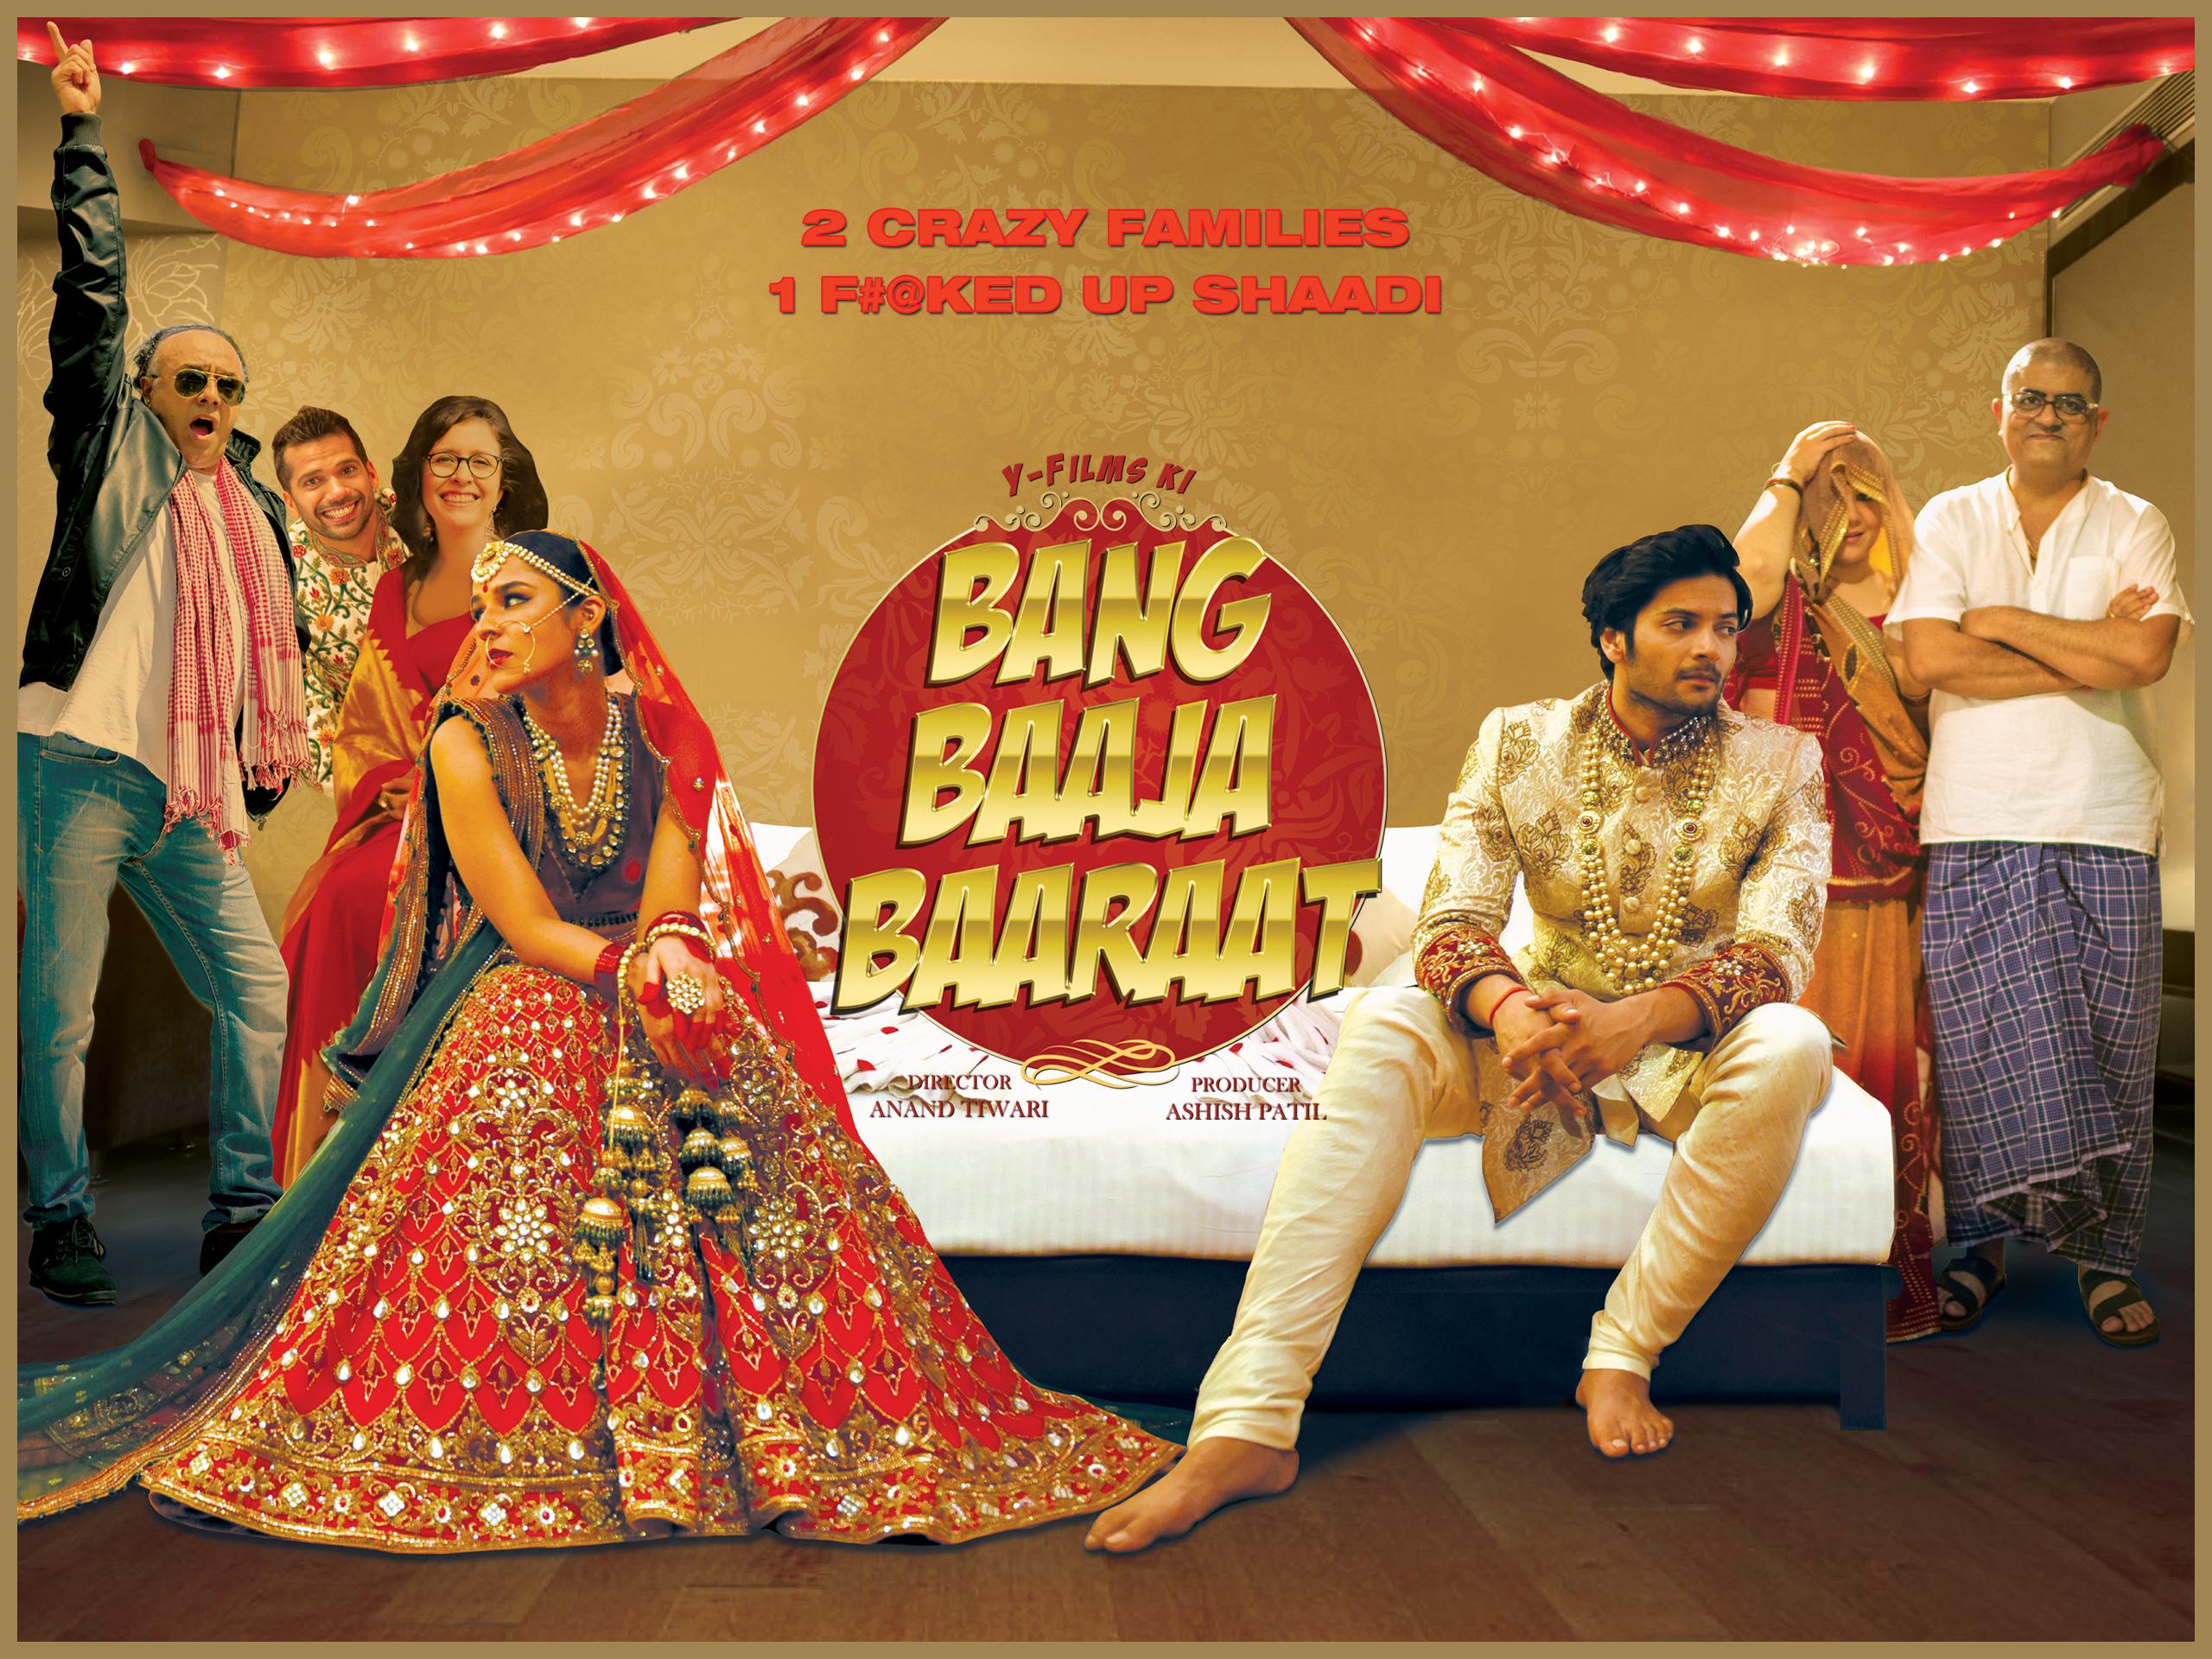 Prime Video: Bang Baaja Baaraat - Season 1